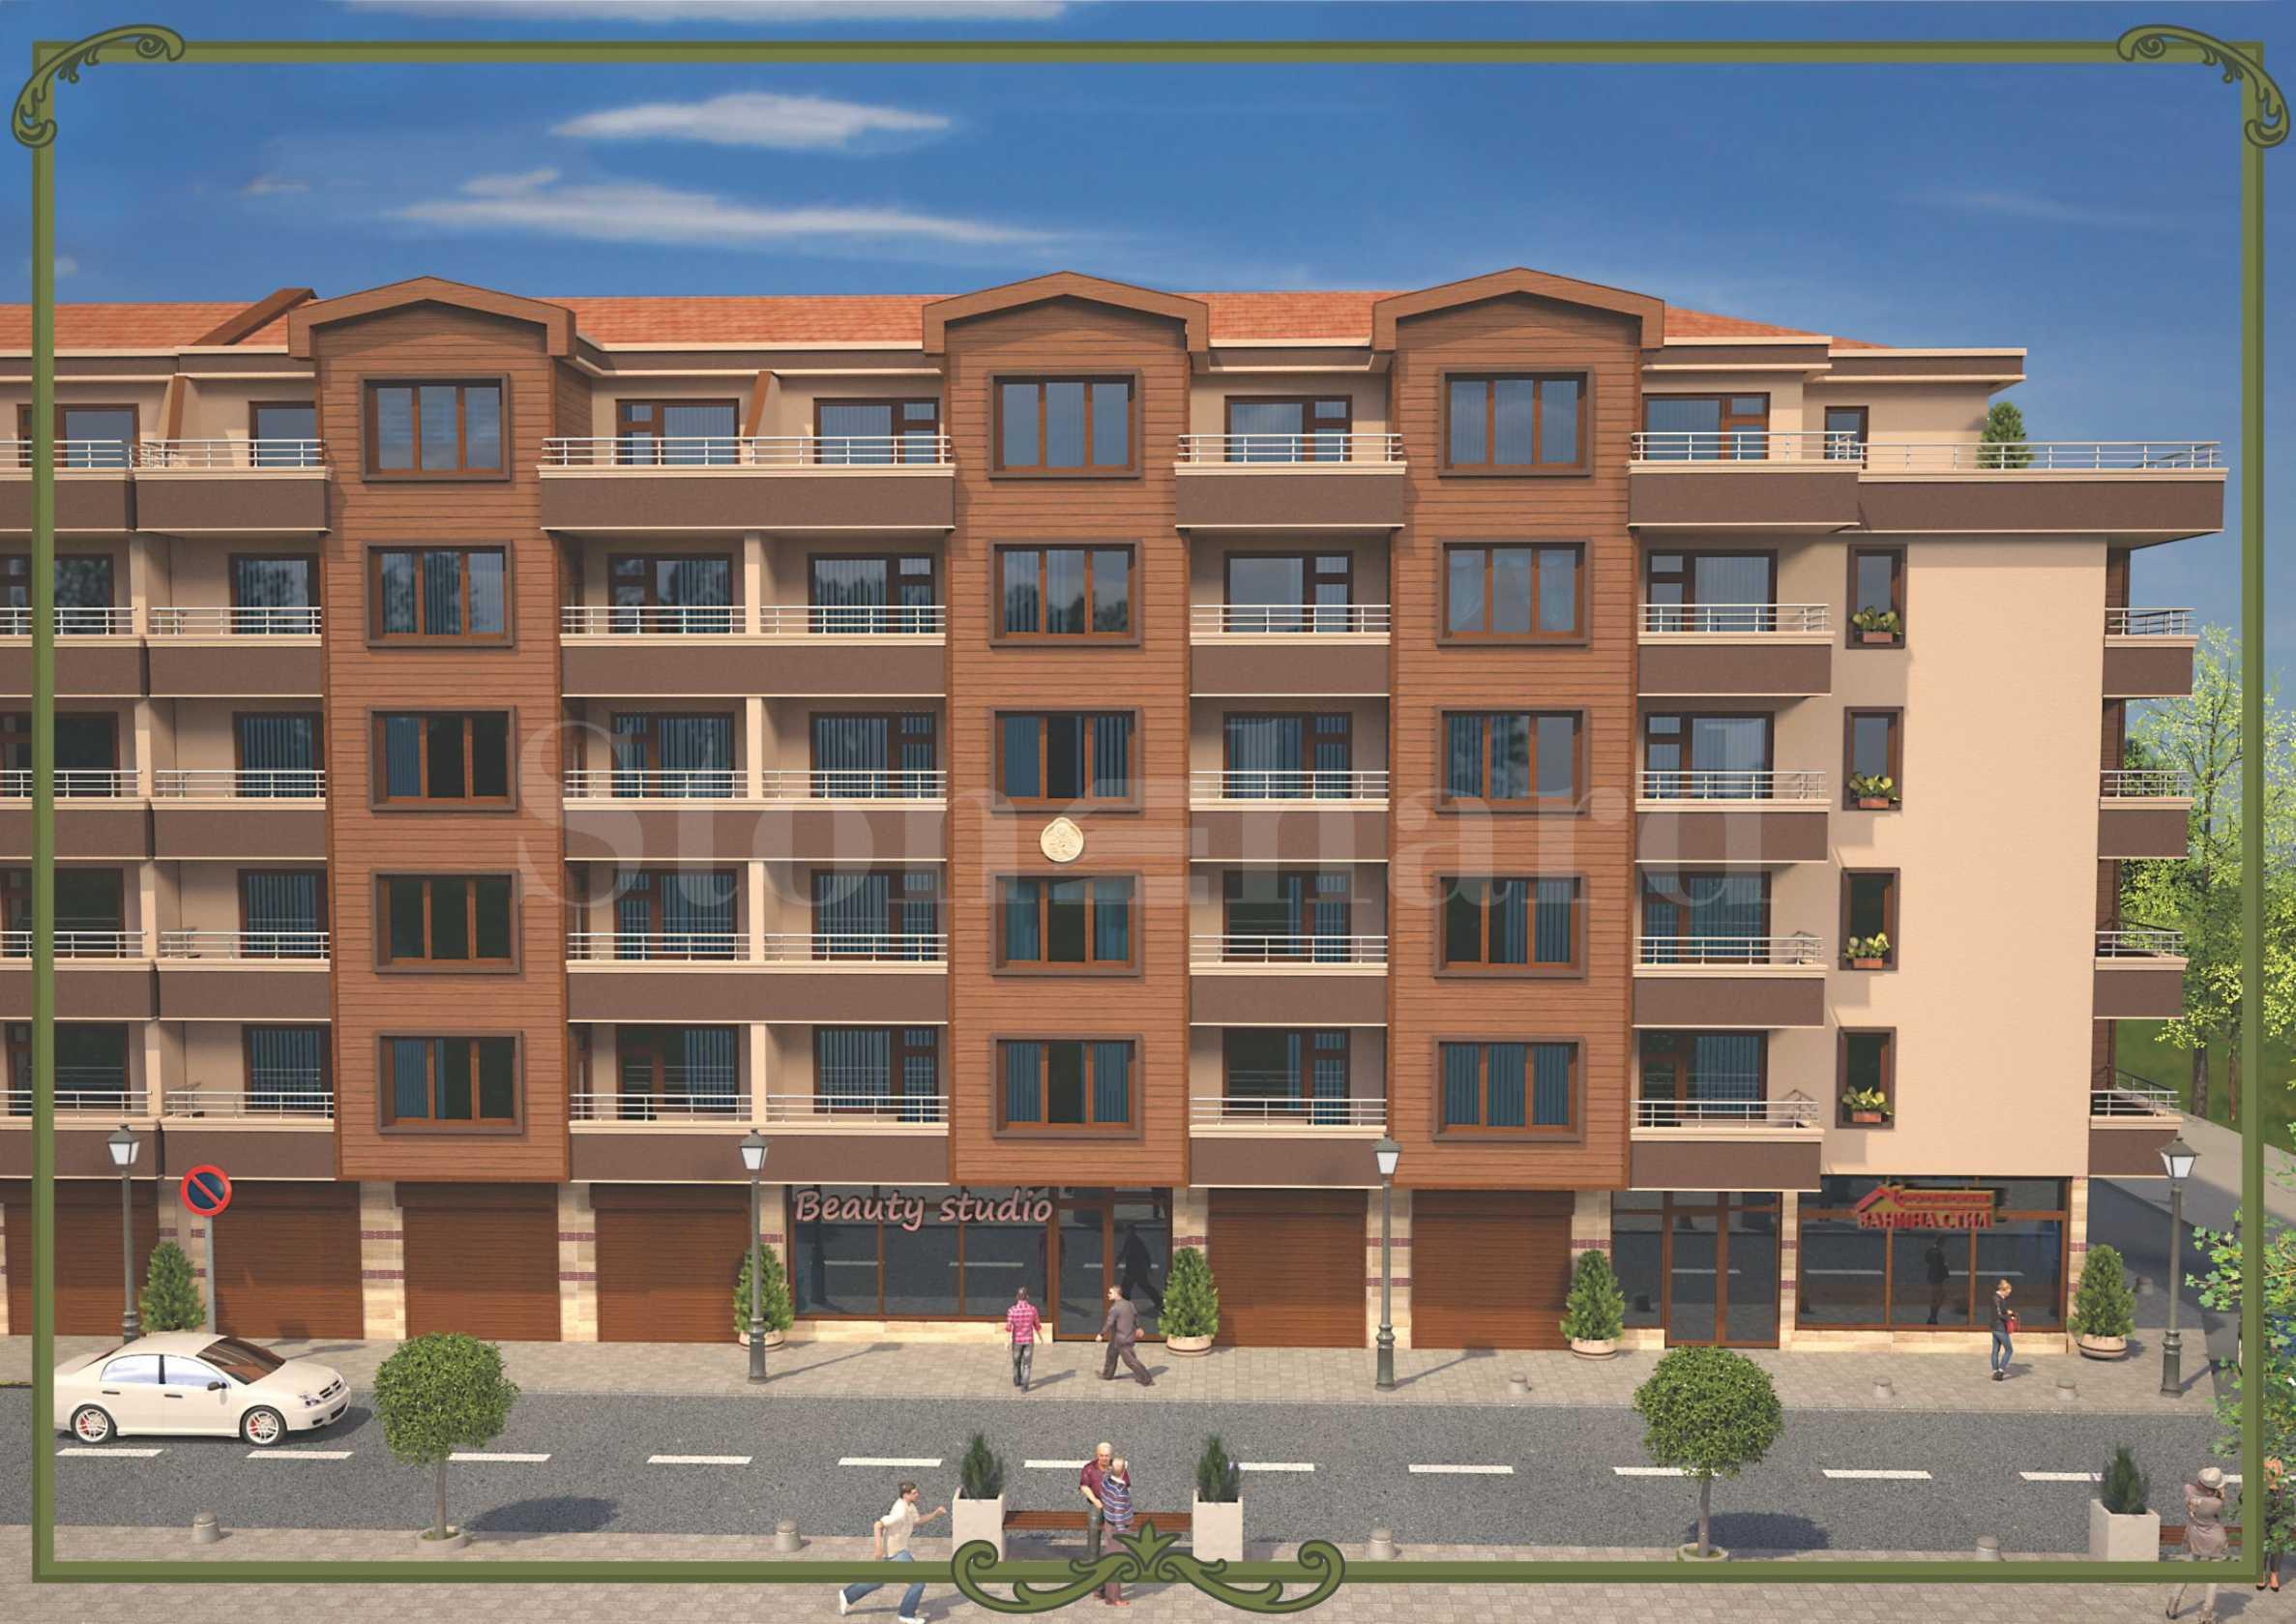 New mixed-use building near Burgas Free University 2 - Stonehard